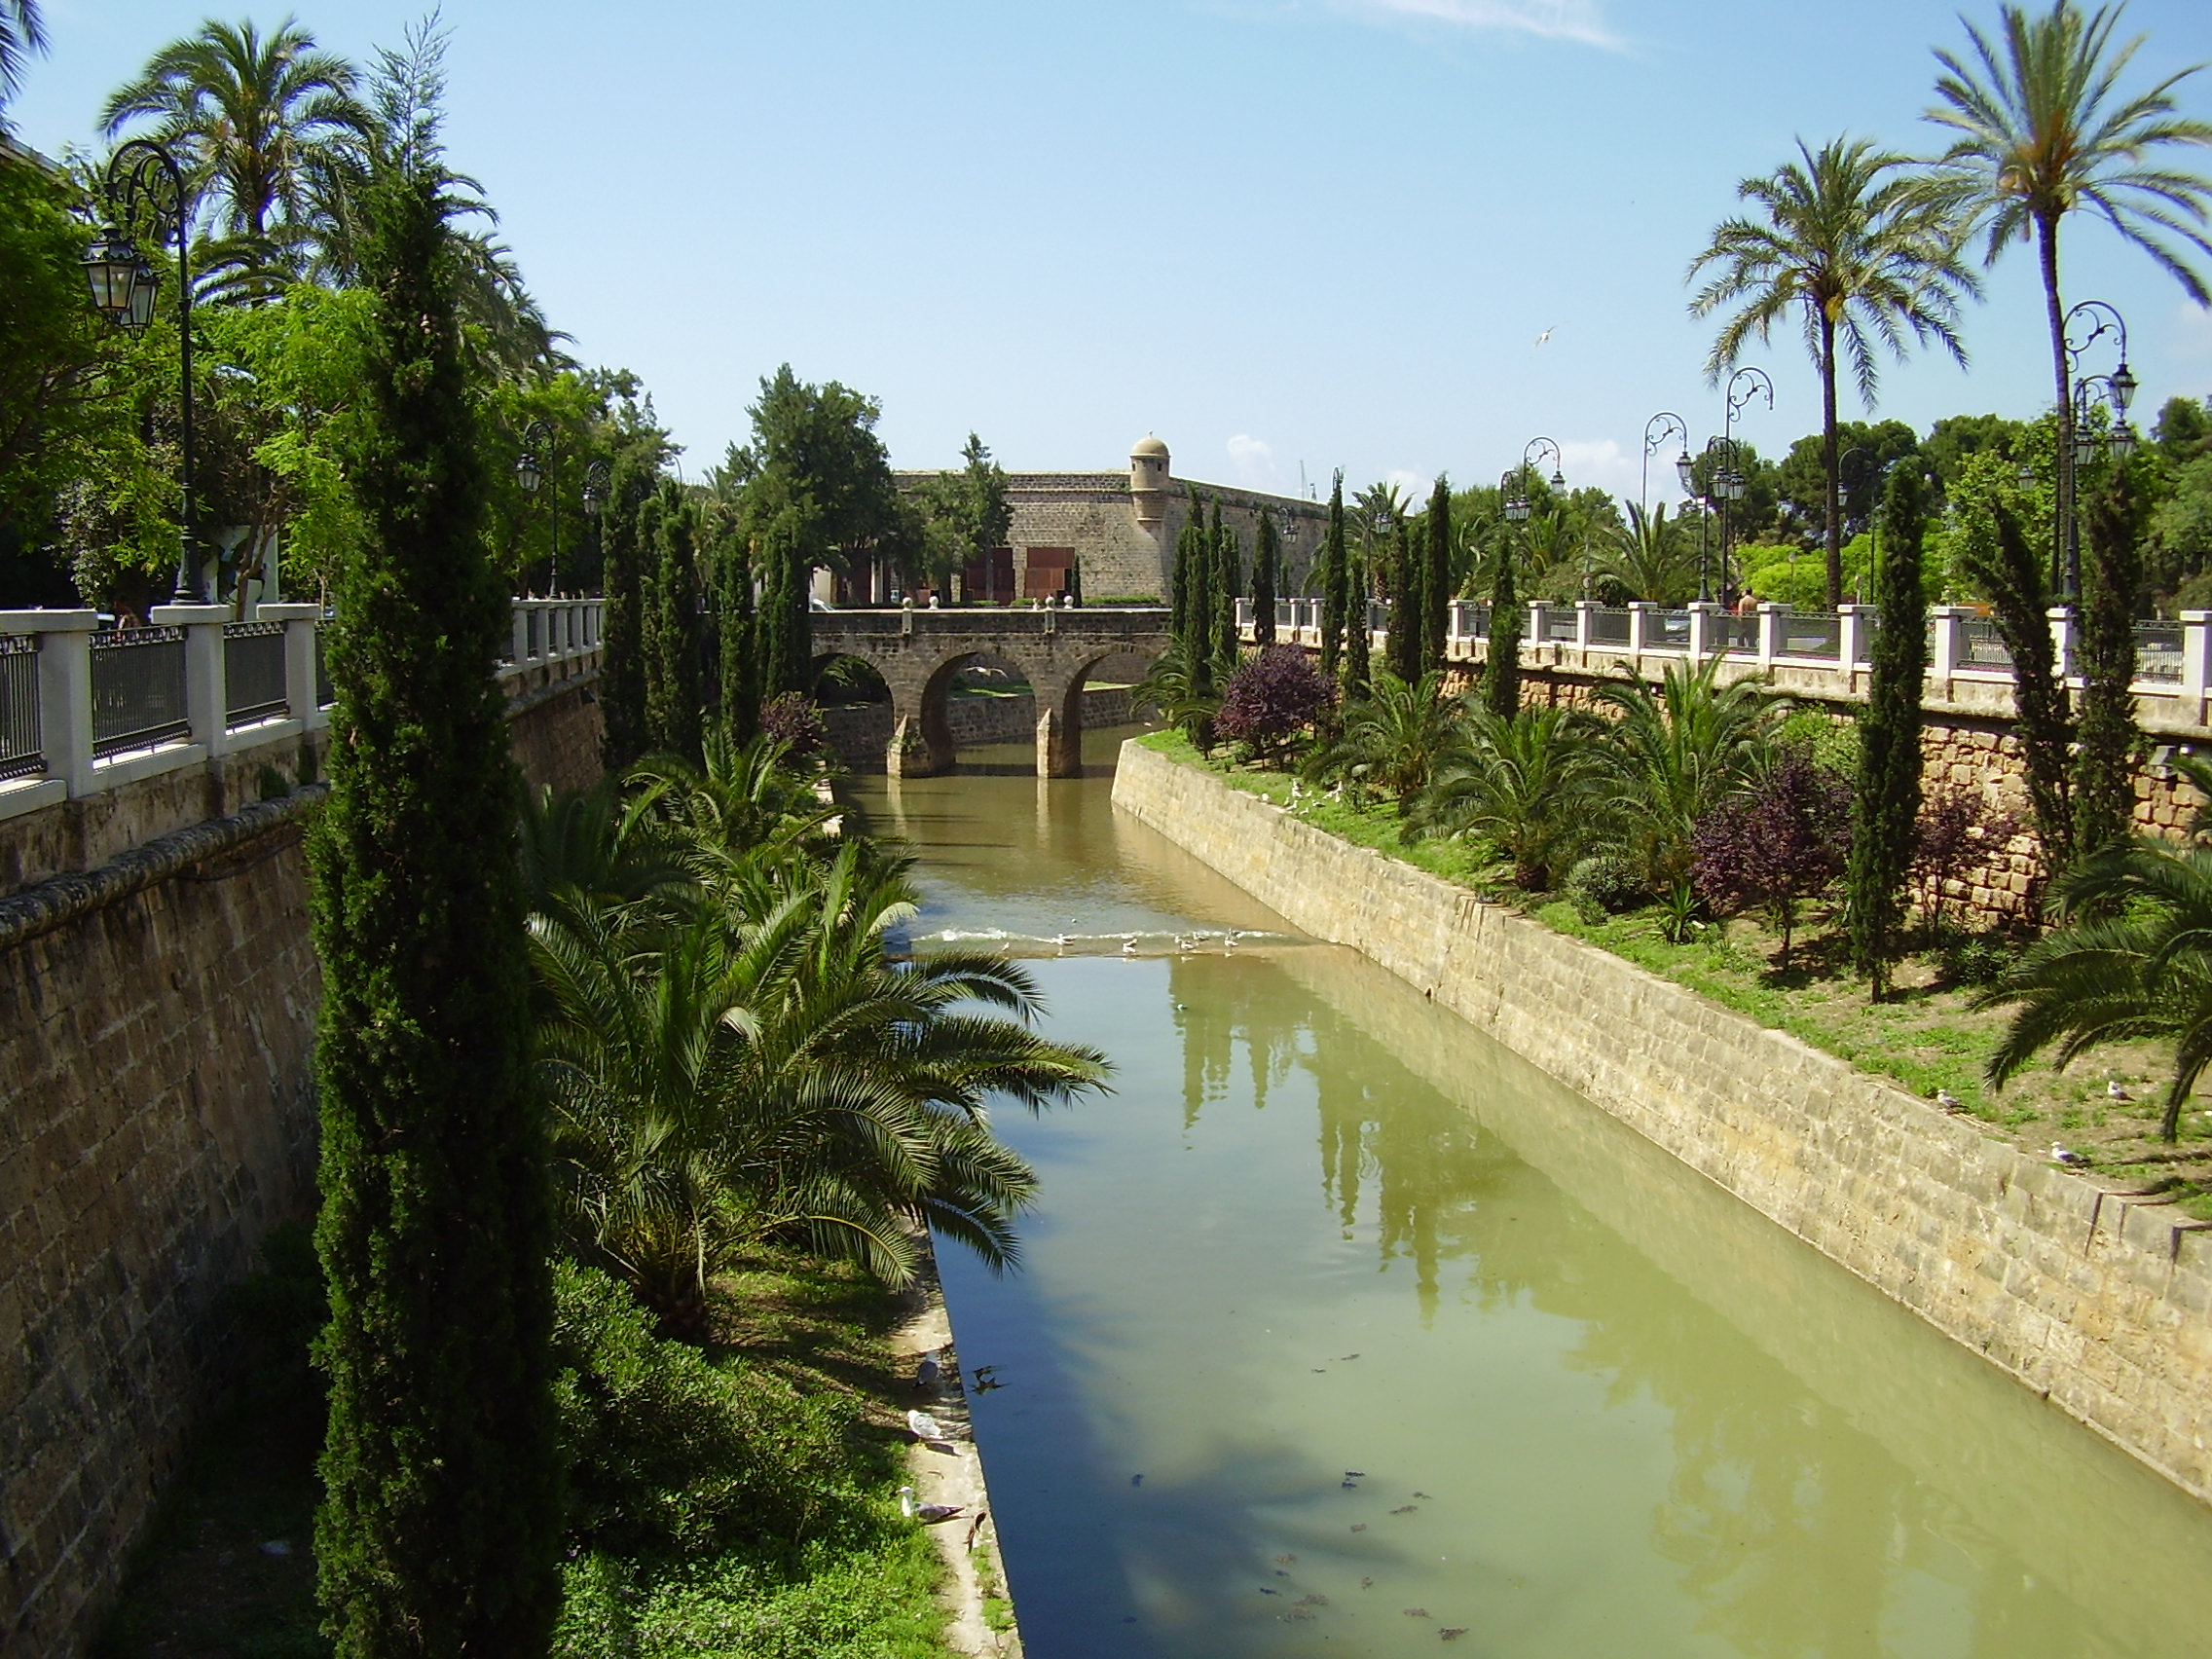 Paseo Mallorca